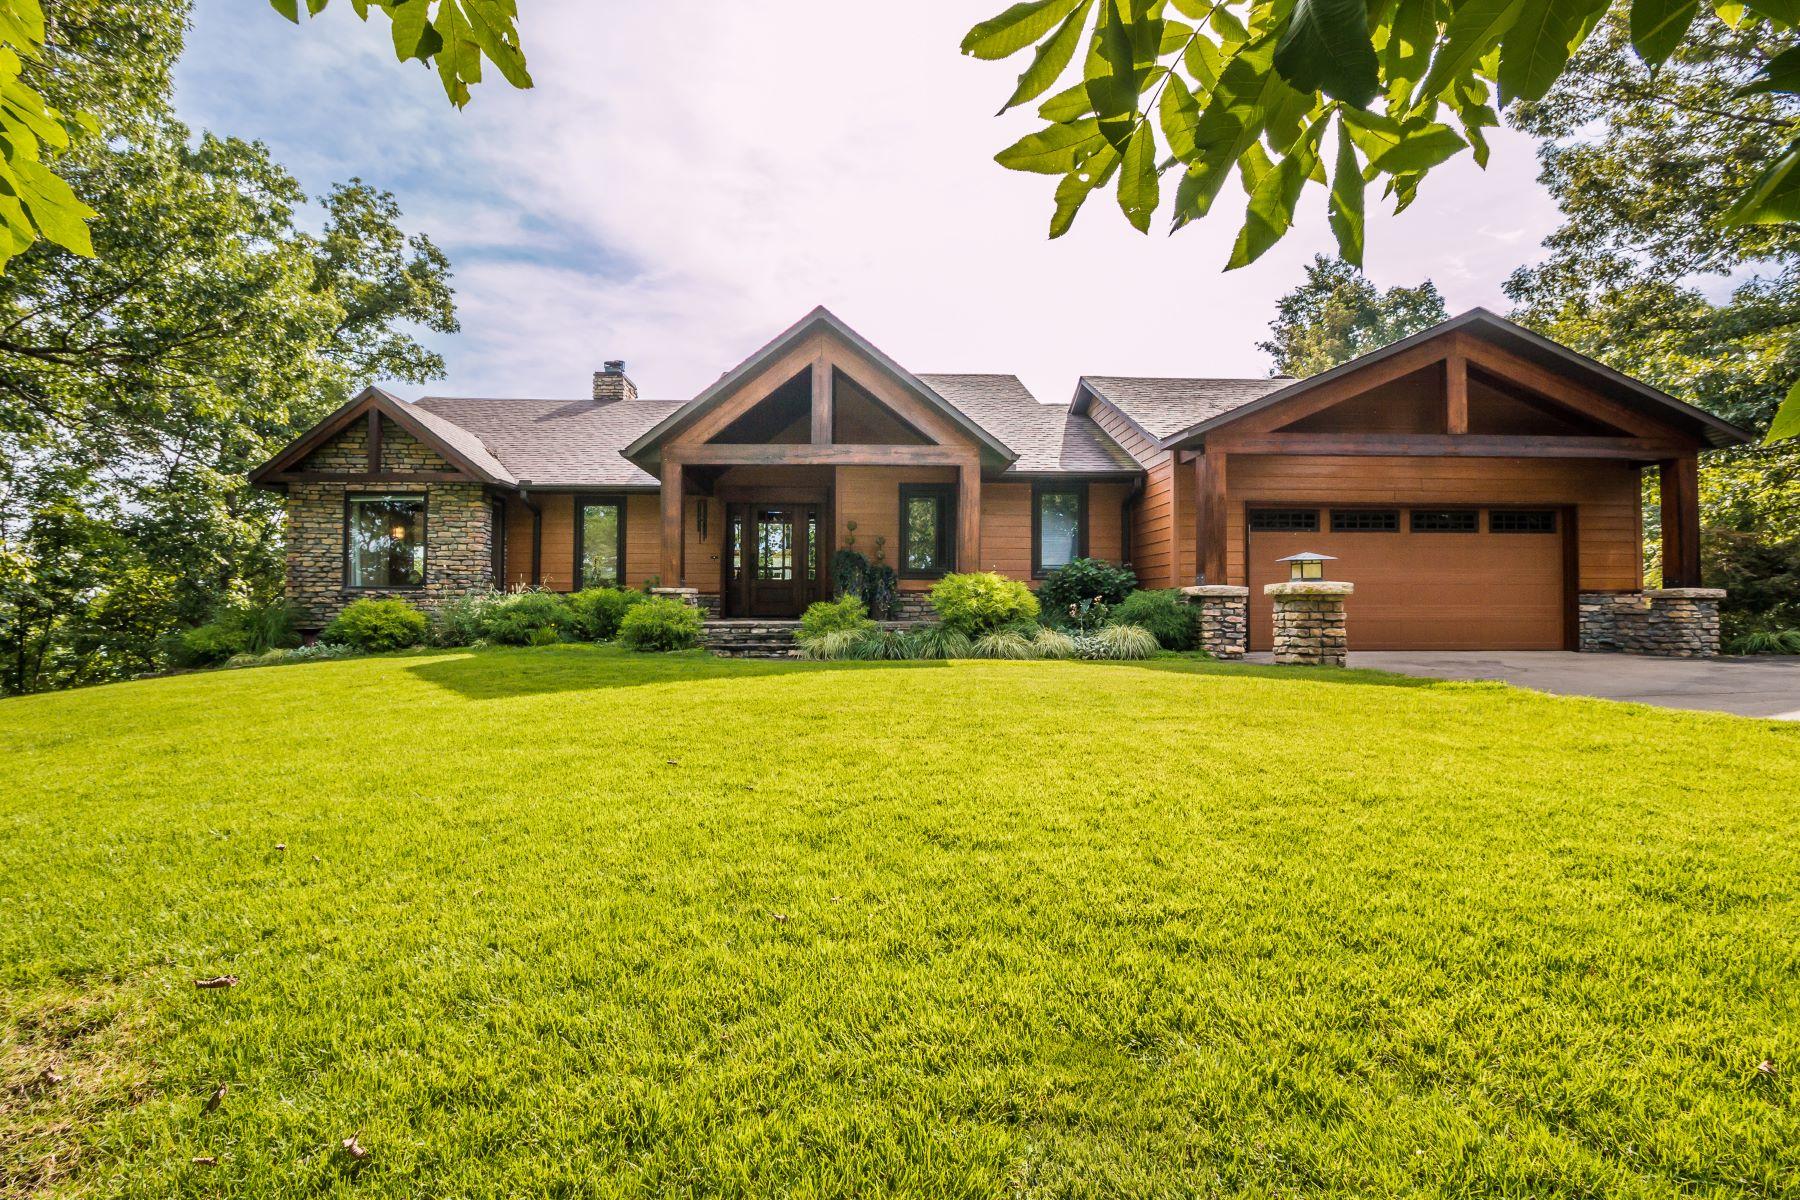 Single Family Homes for Sale at 12 Plockton Lane Bella Vista, Arkansas 72715 United States